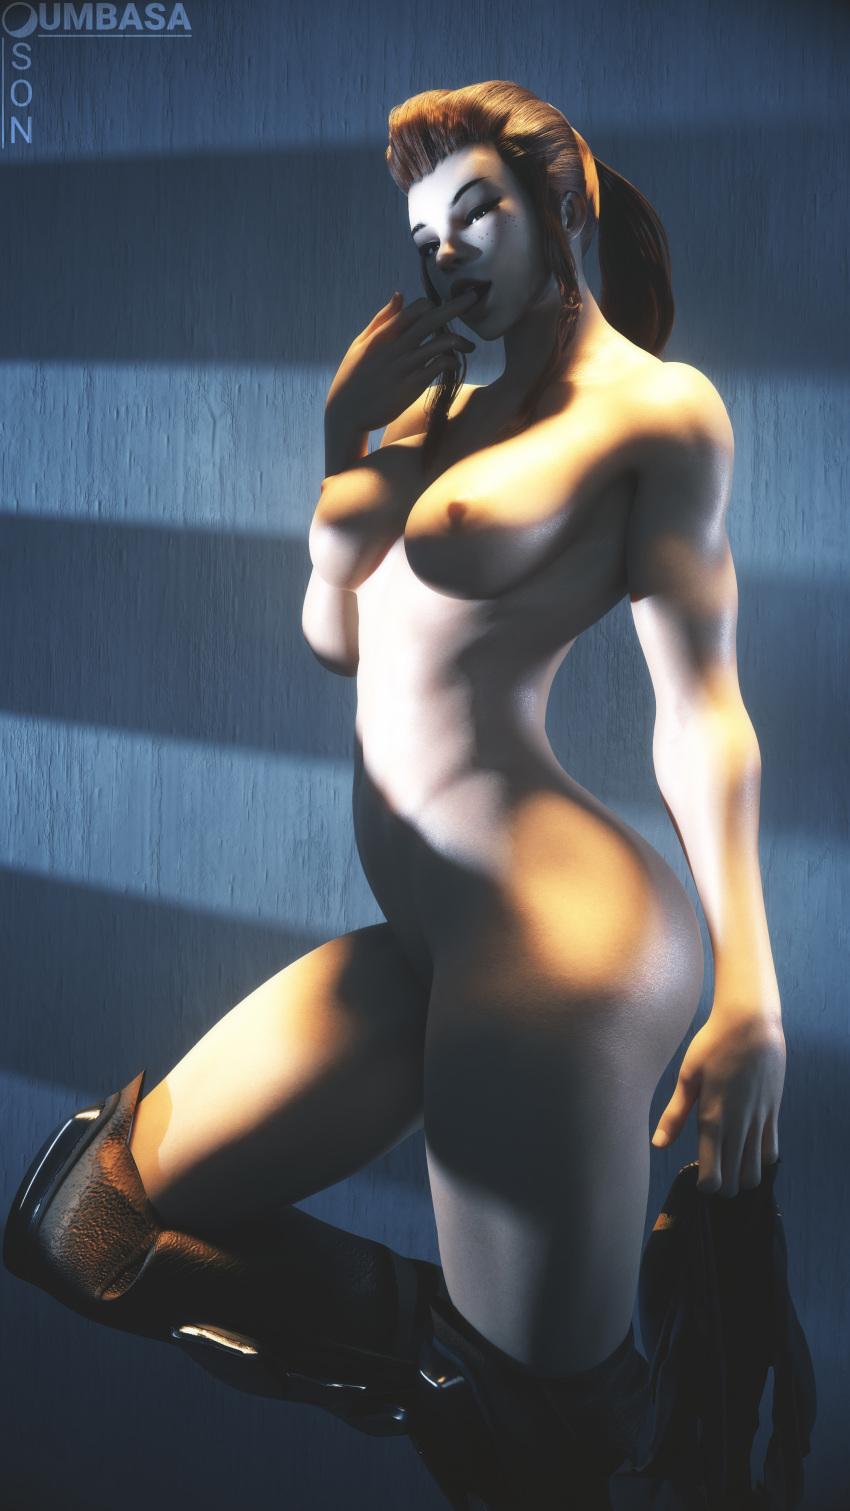 overwatch-hentai-xxx-–-breasts,-solo,-solo-female,-muscular-female.